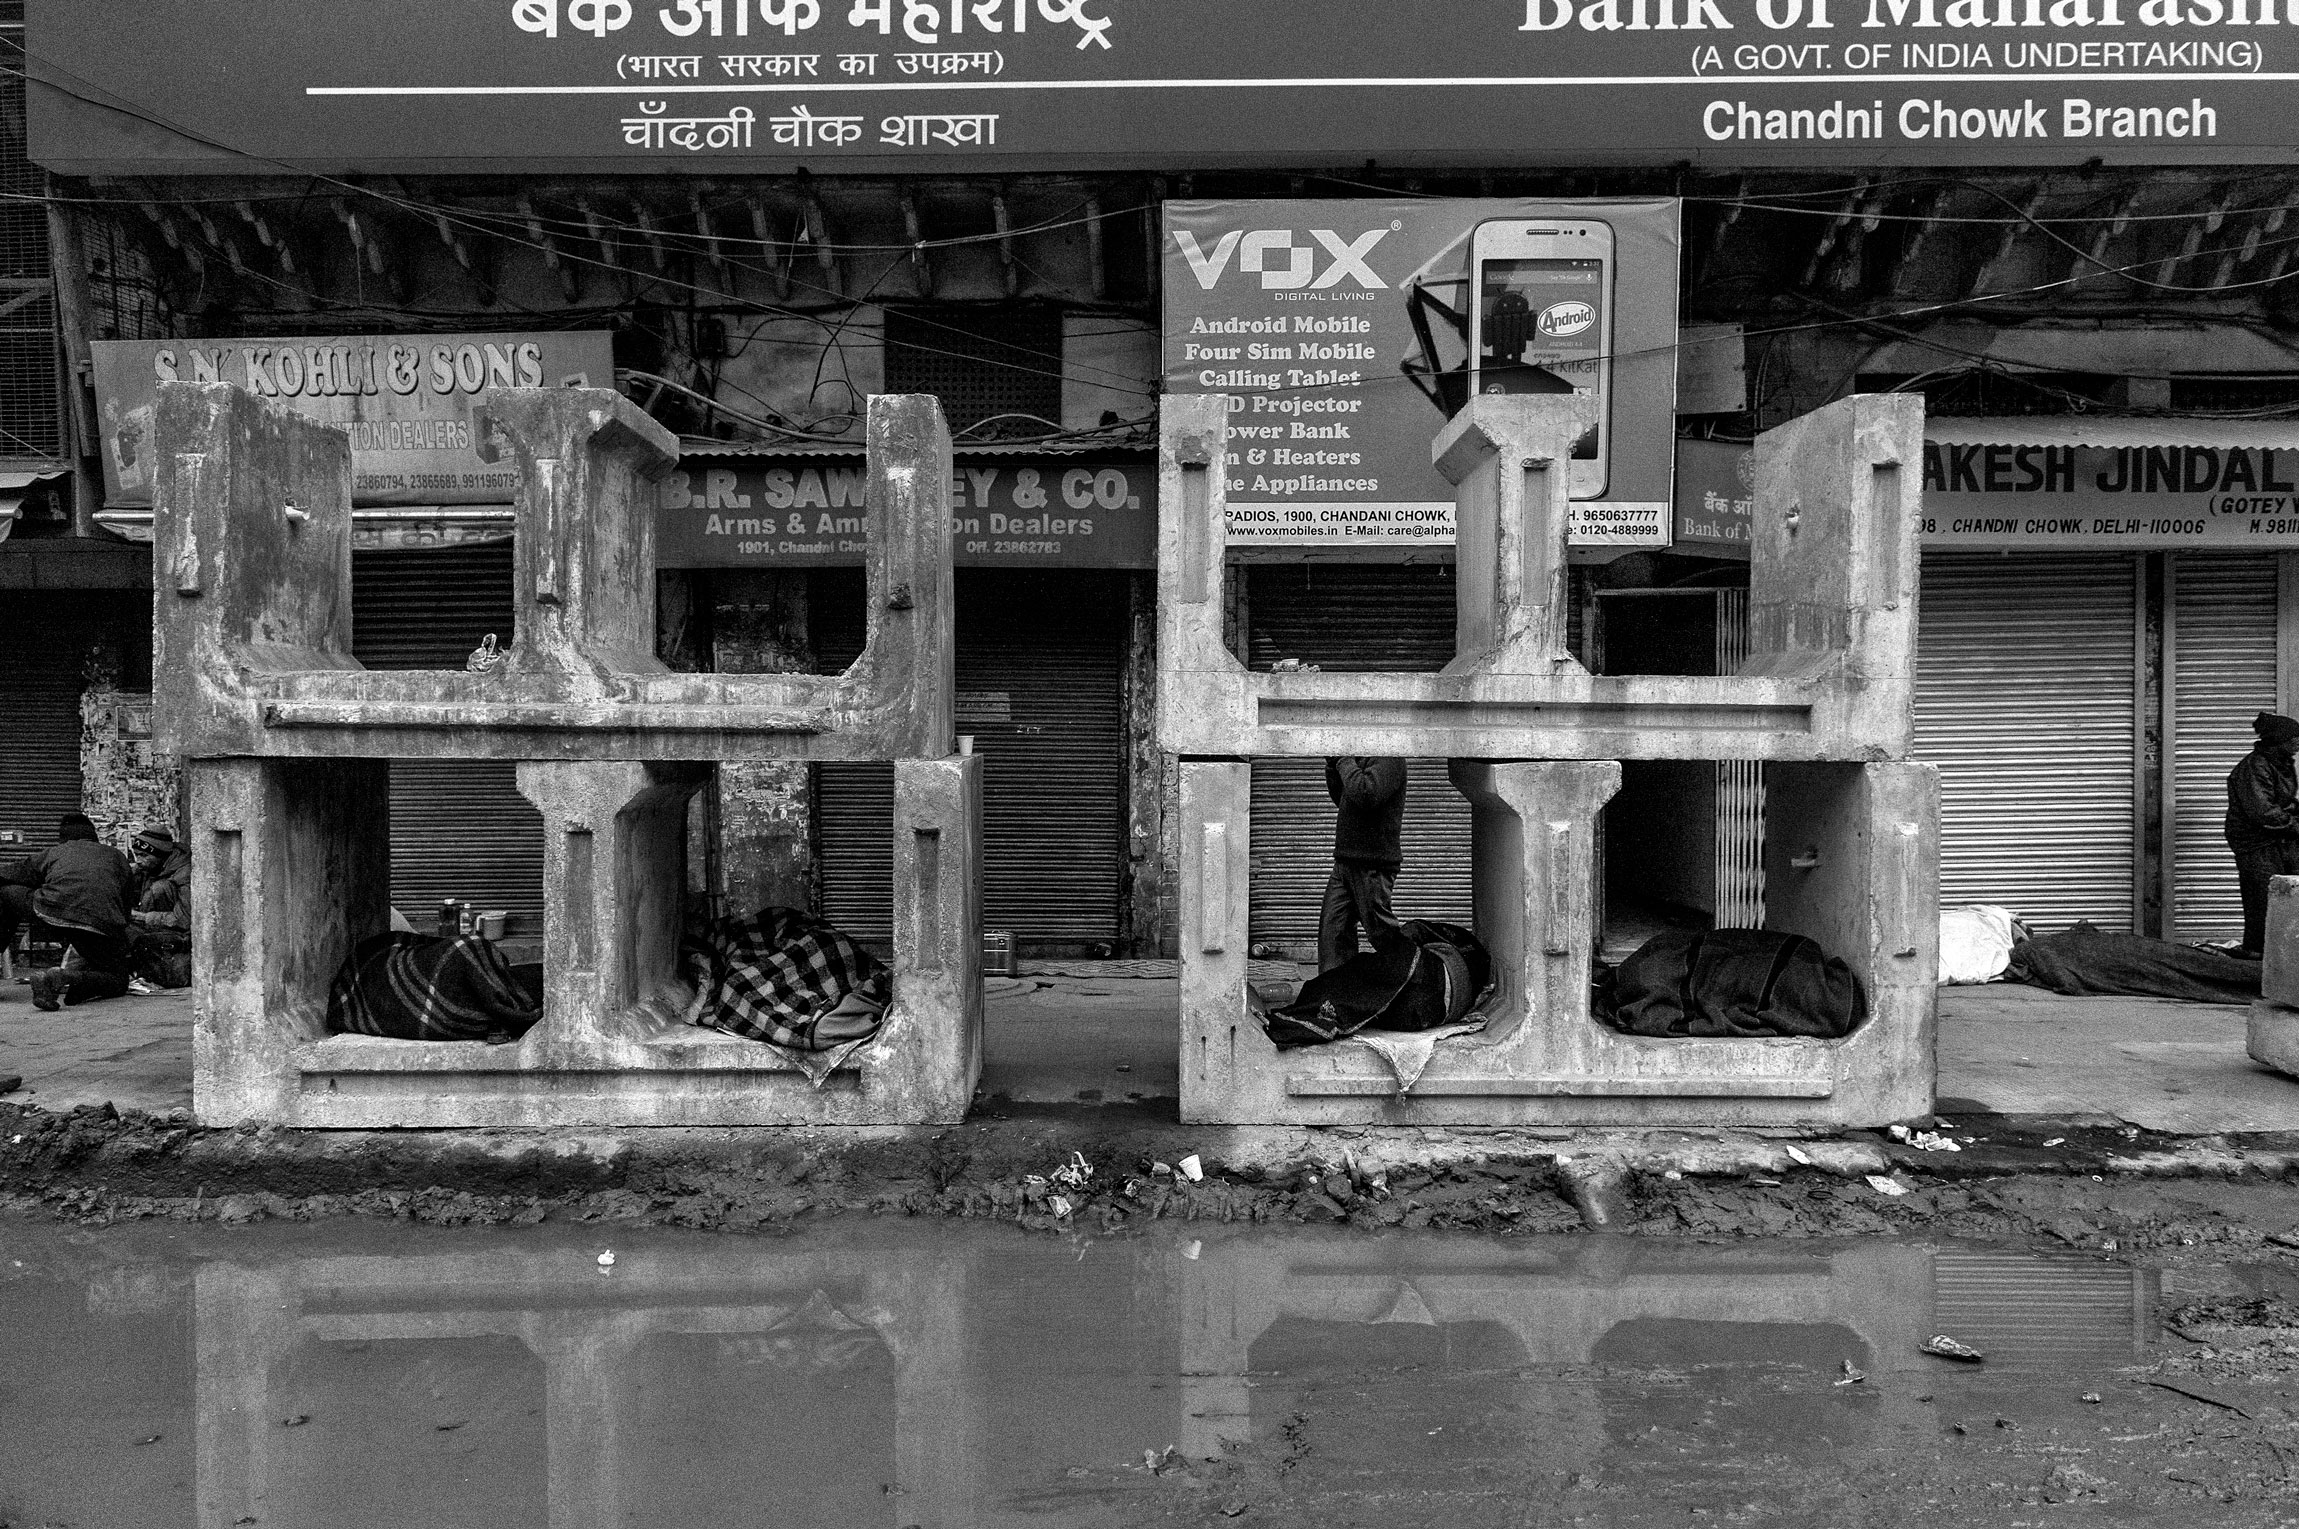 old delhi india 01.01.2015